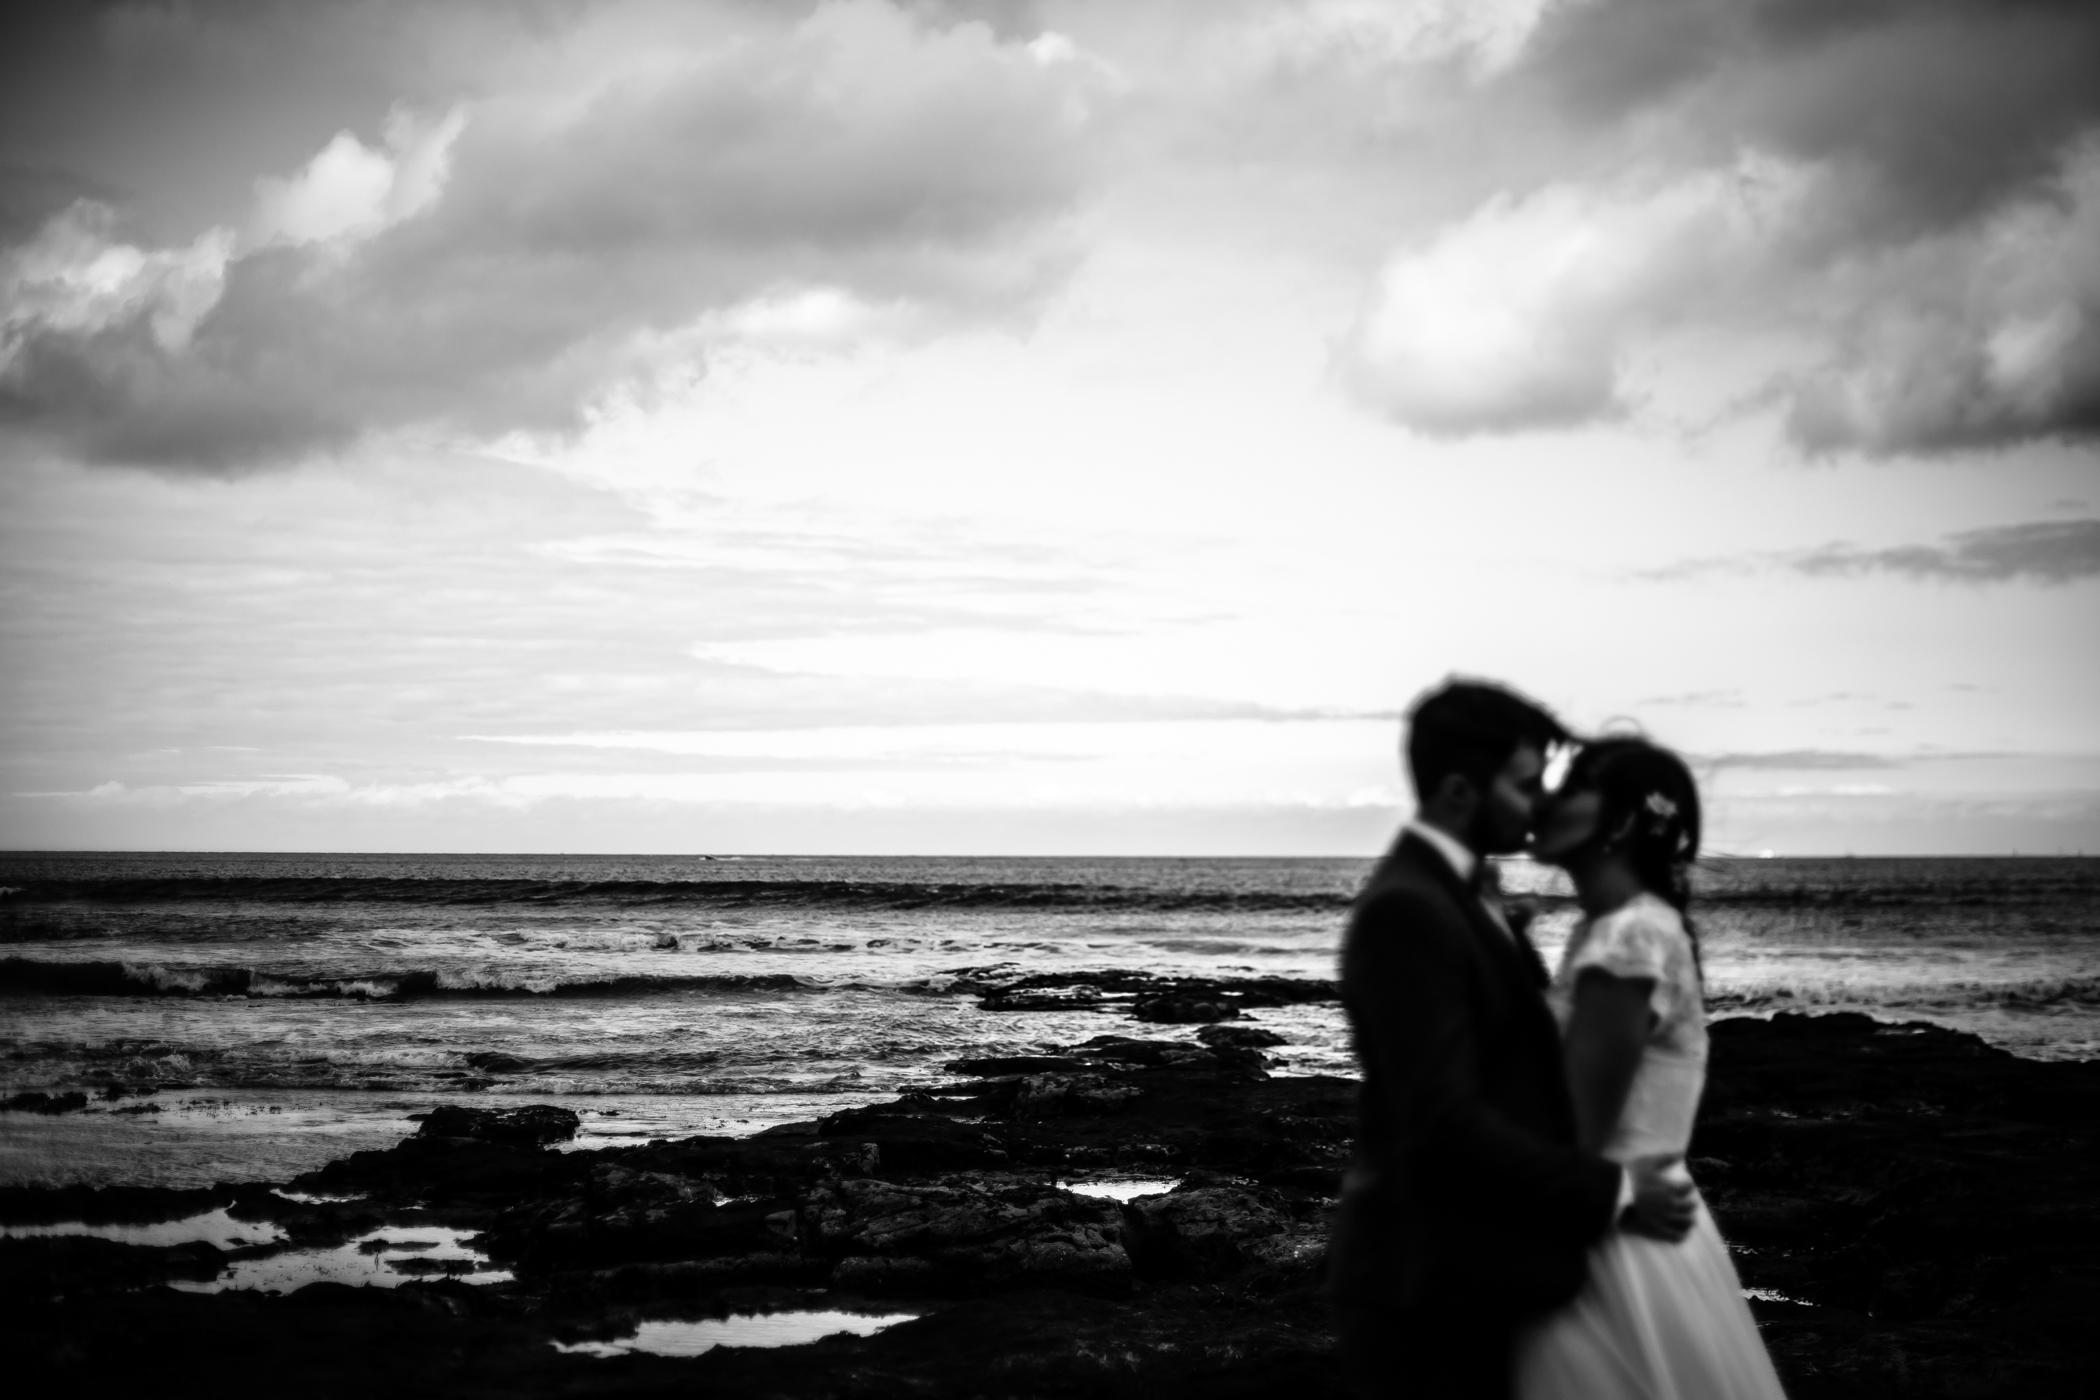 sansom photography beach wedding photography charlotte & mike-16